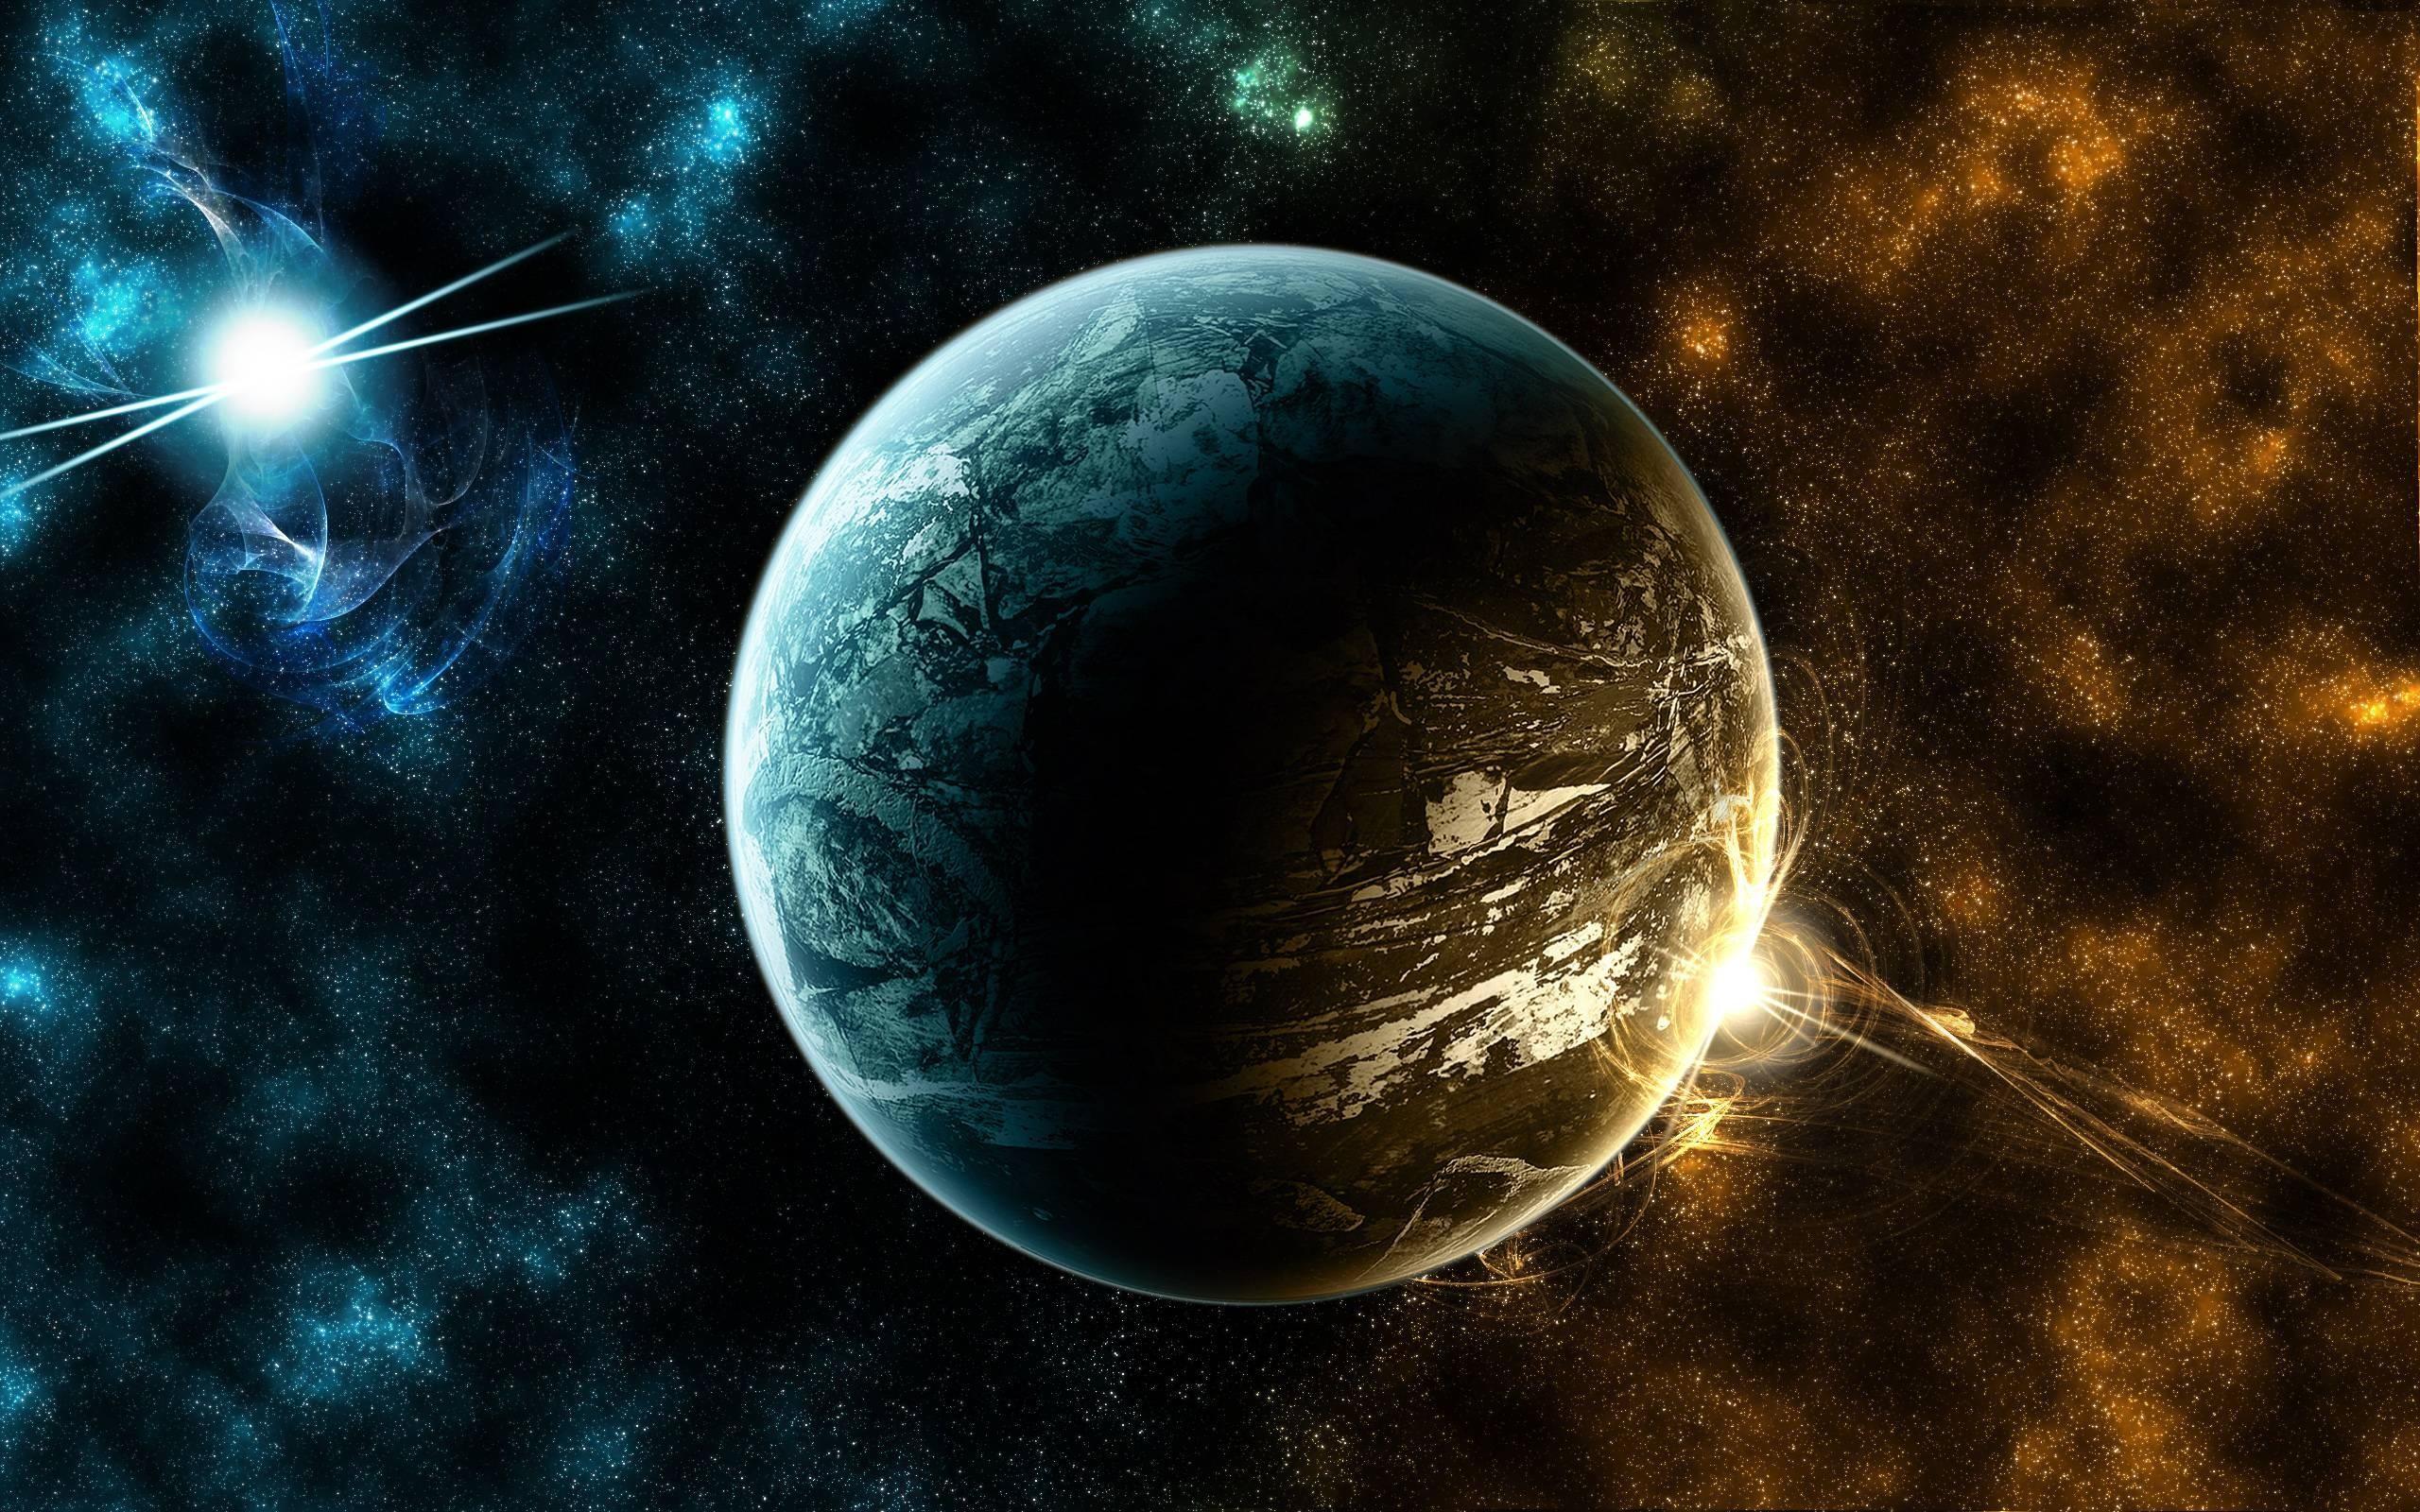 Universe Wallpaper Hd Stargate Space Wallpapers 2560x1600px